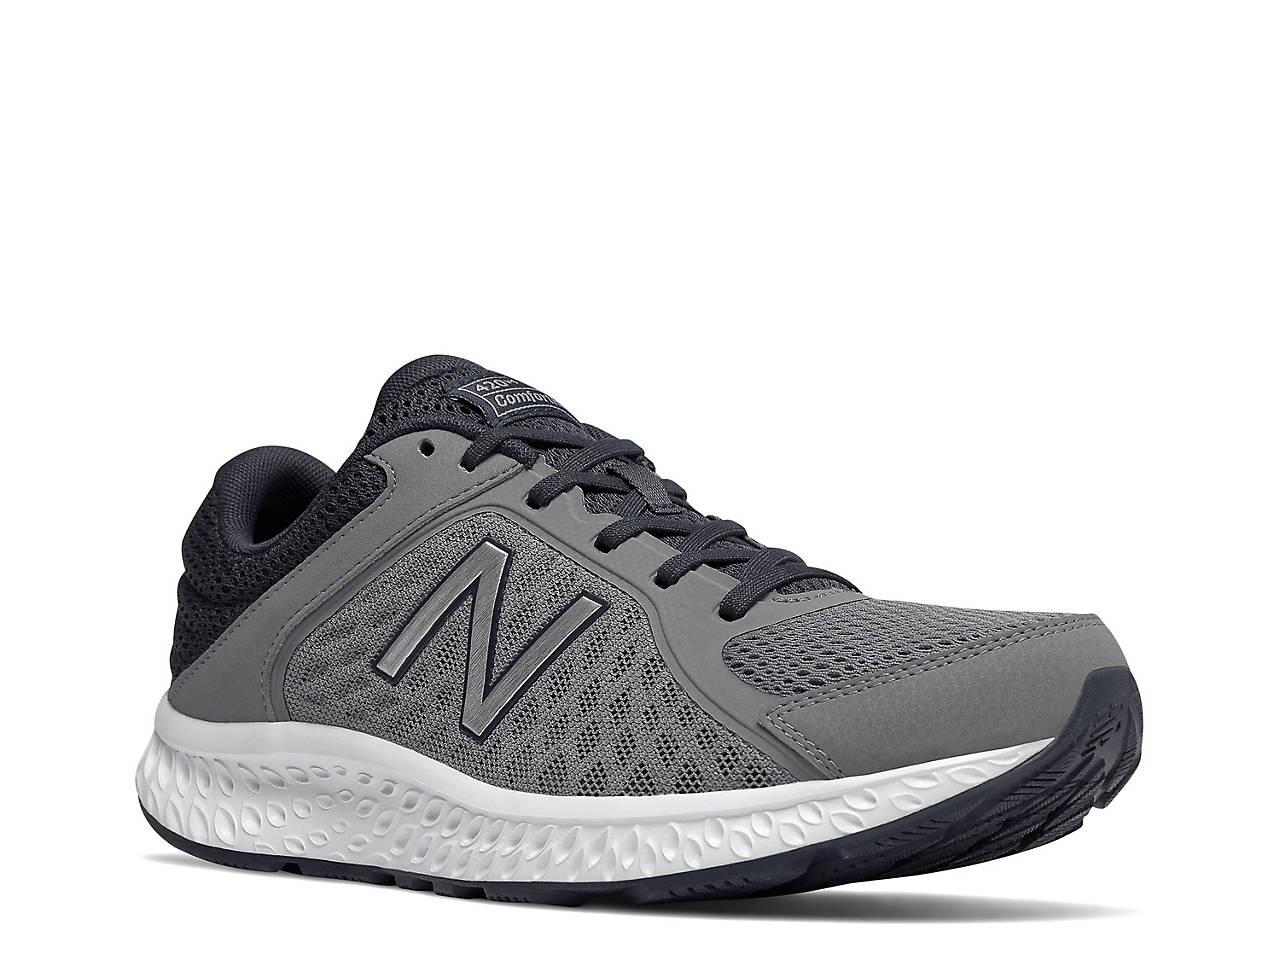 6d95f67a1 New Balance 420 V4 Running Shoe - Men's Men's Shoes | DSW